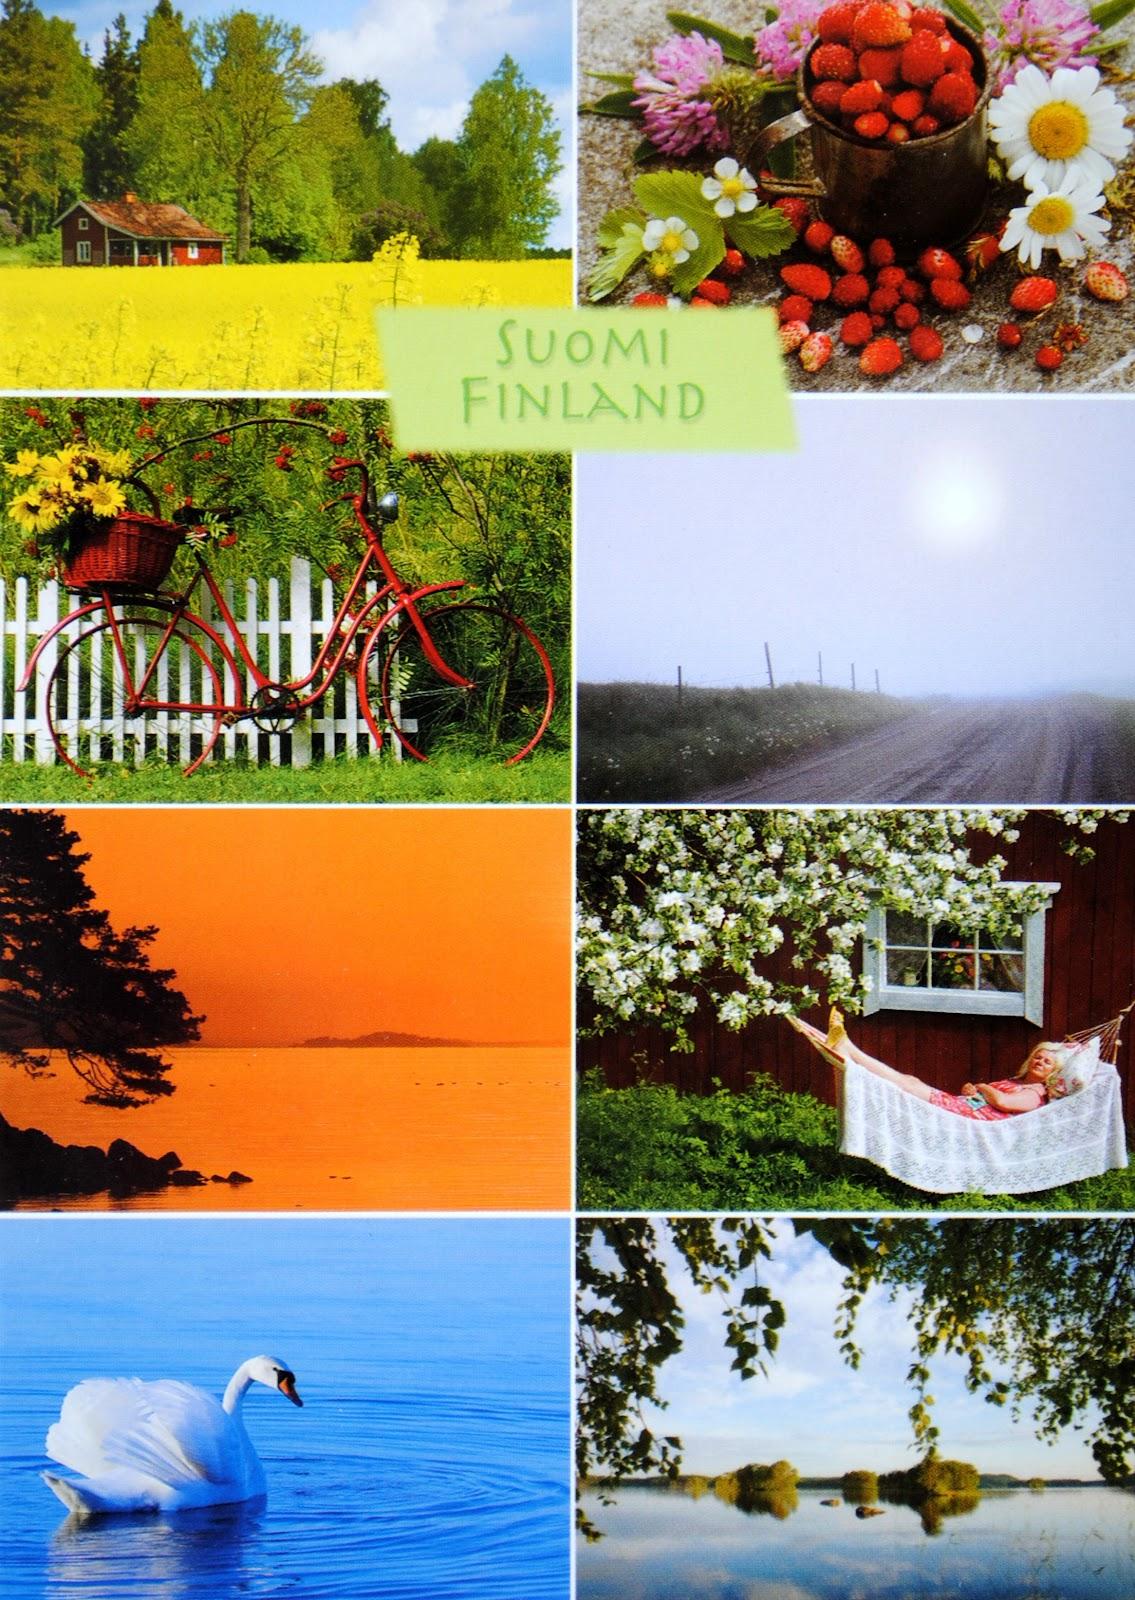 krajobrazy finlandii